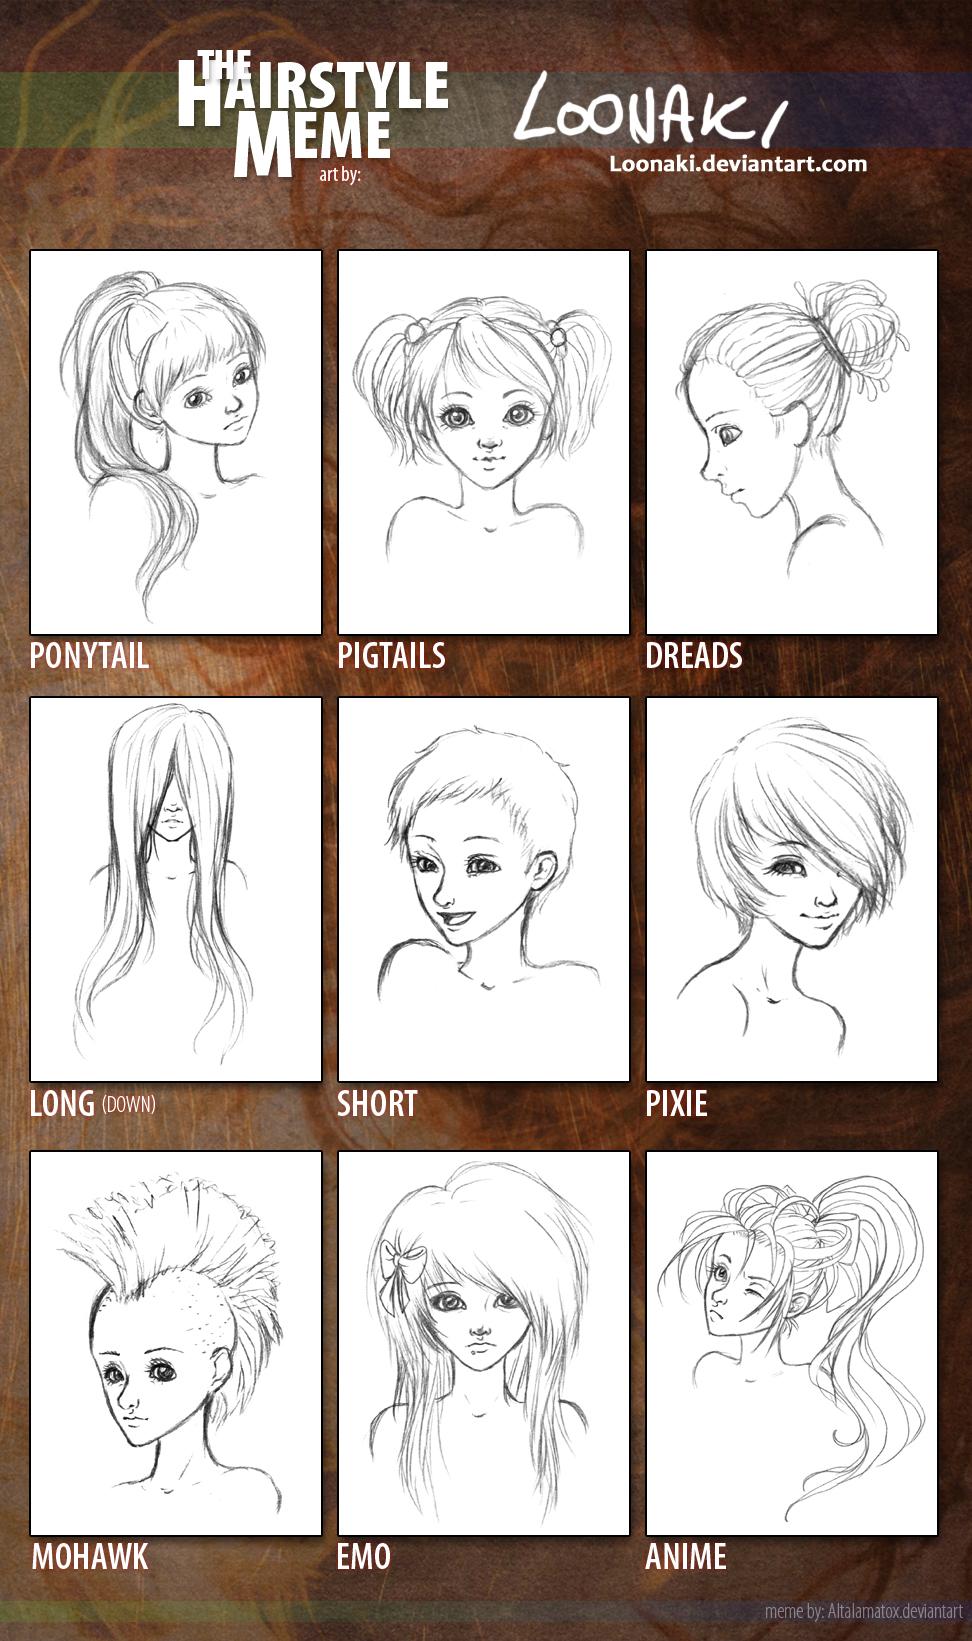 Hairstyle Meme By Loonaki Hairstyle Meme By Loonaki